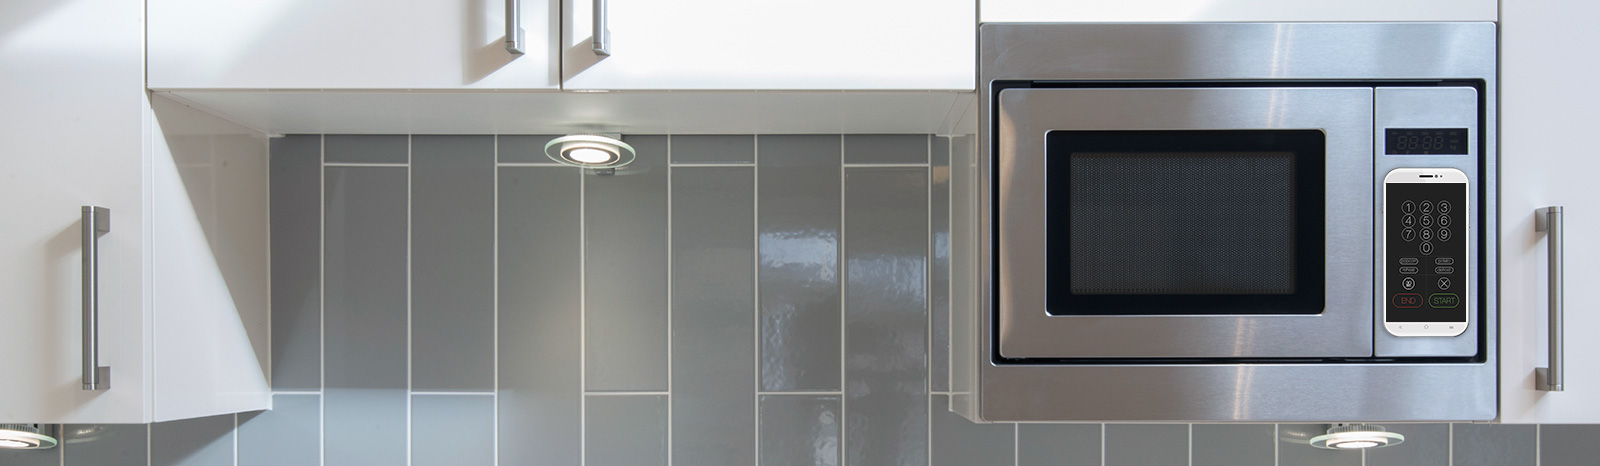 header-microwave-smartphone